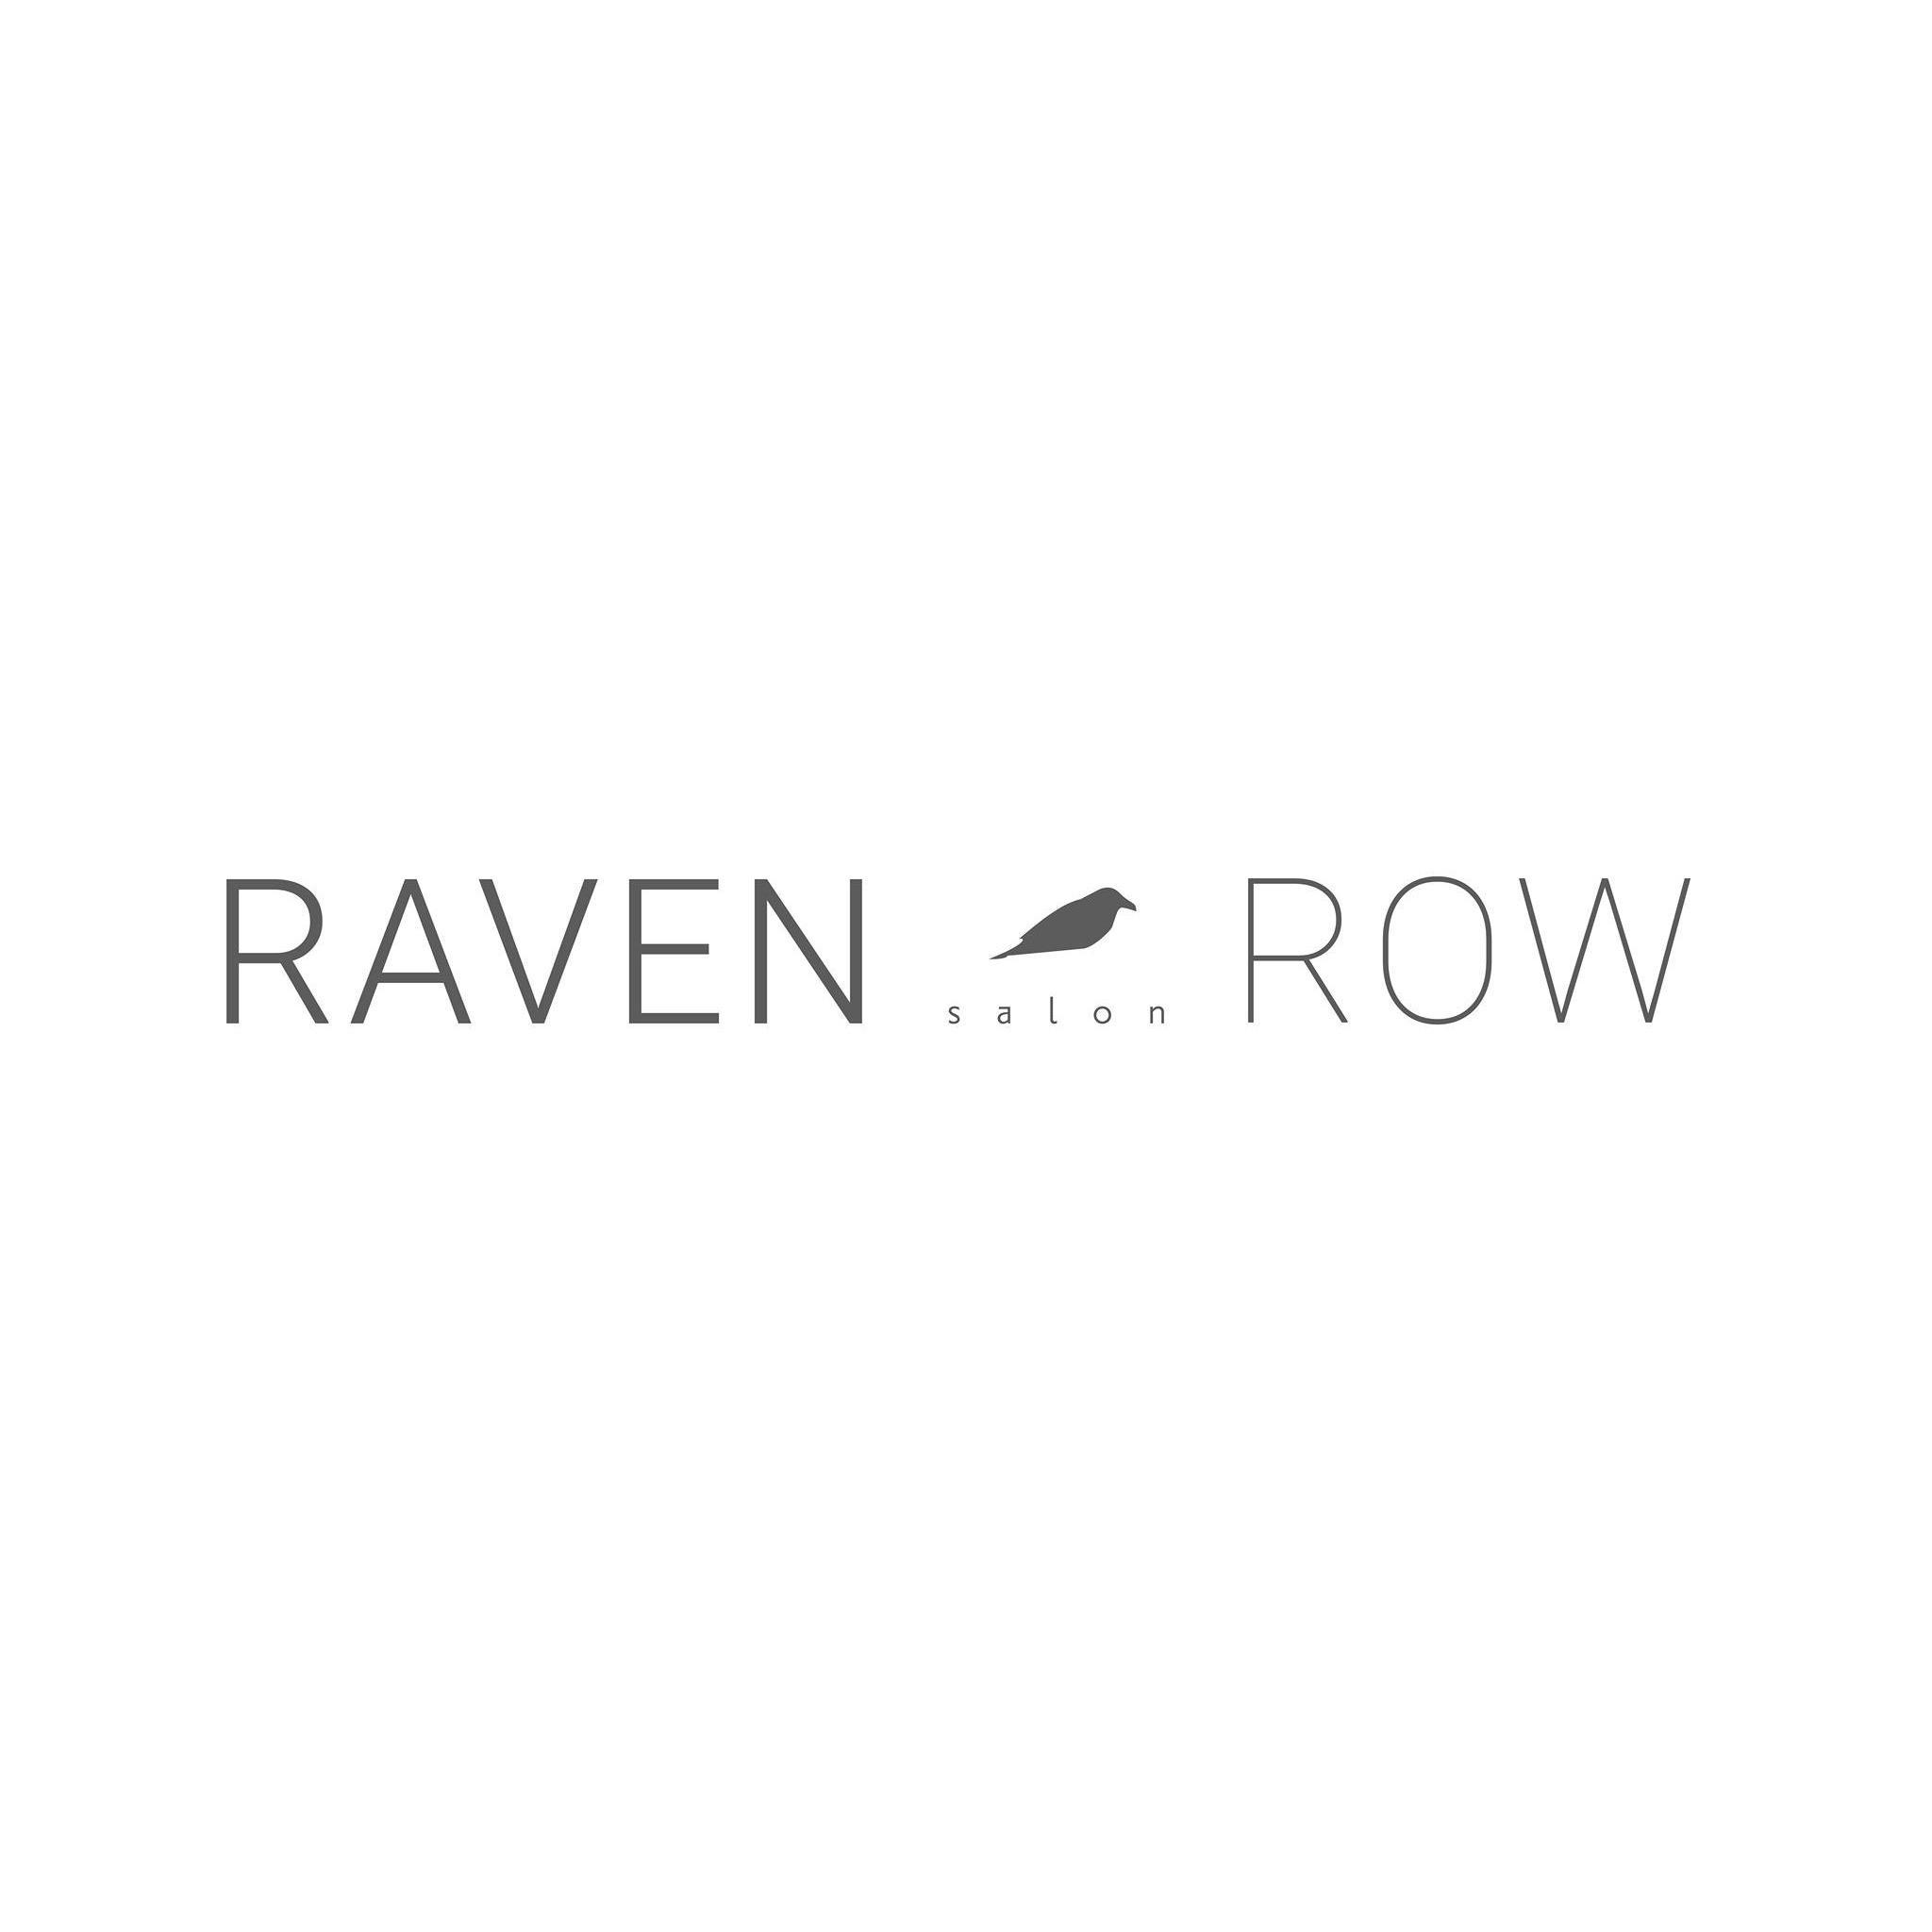 Raven Row Salon